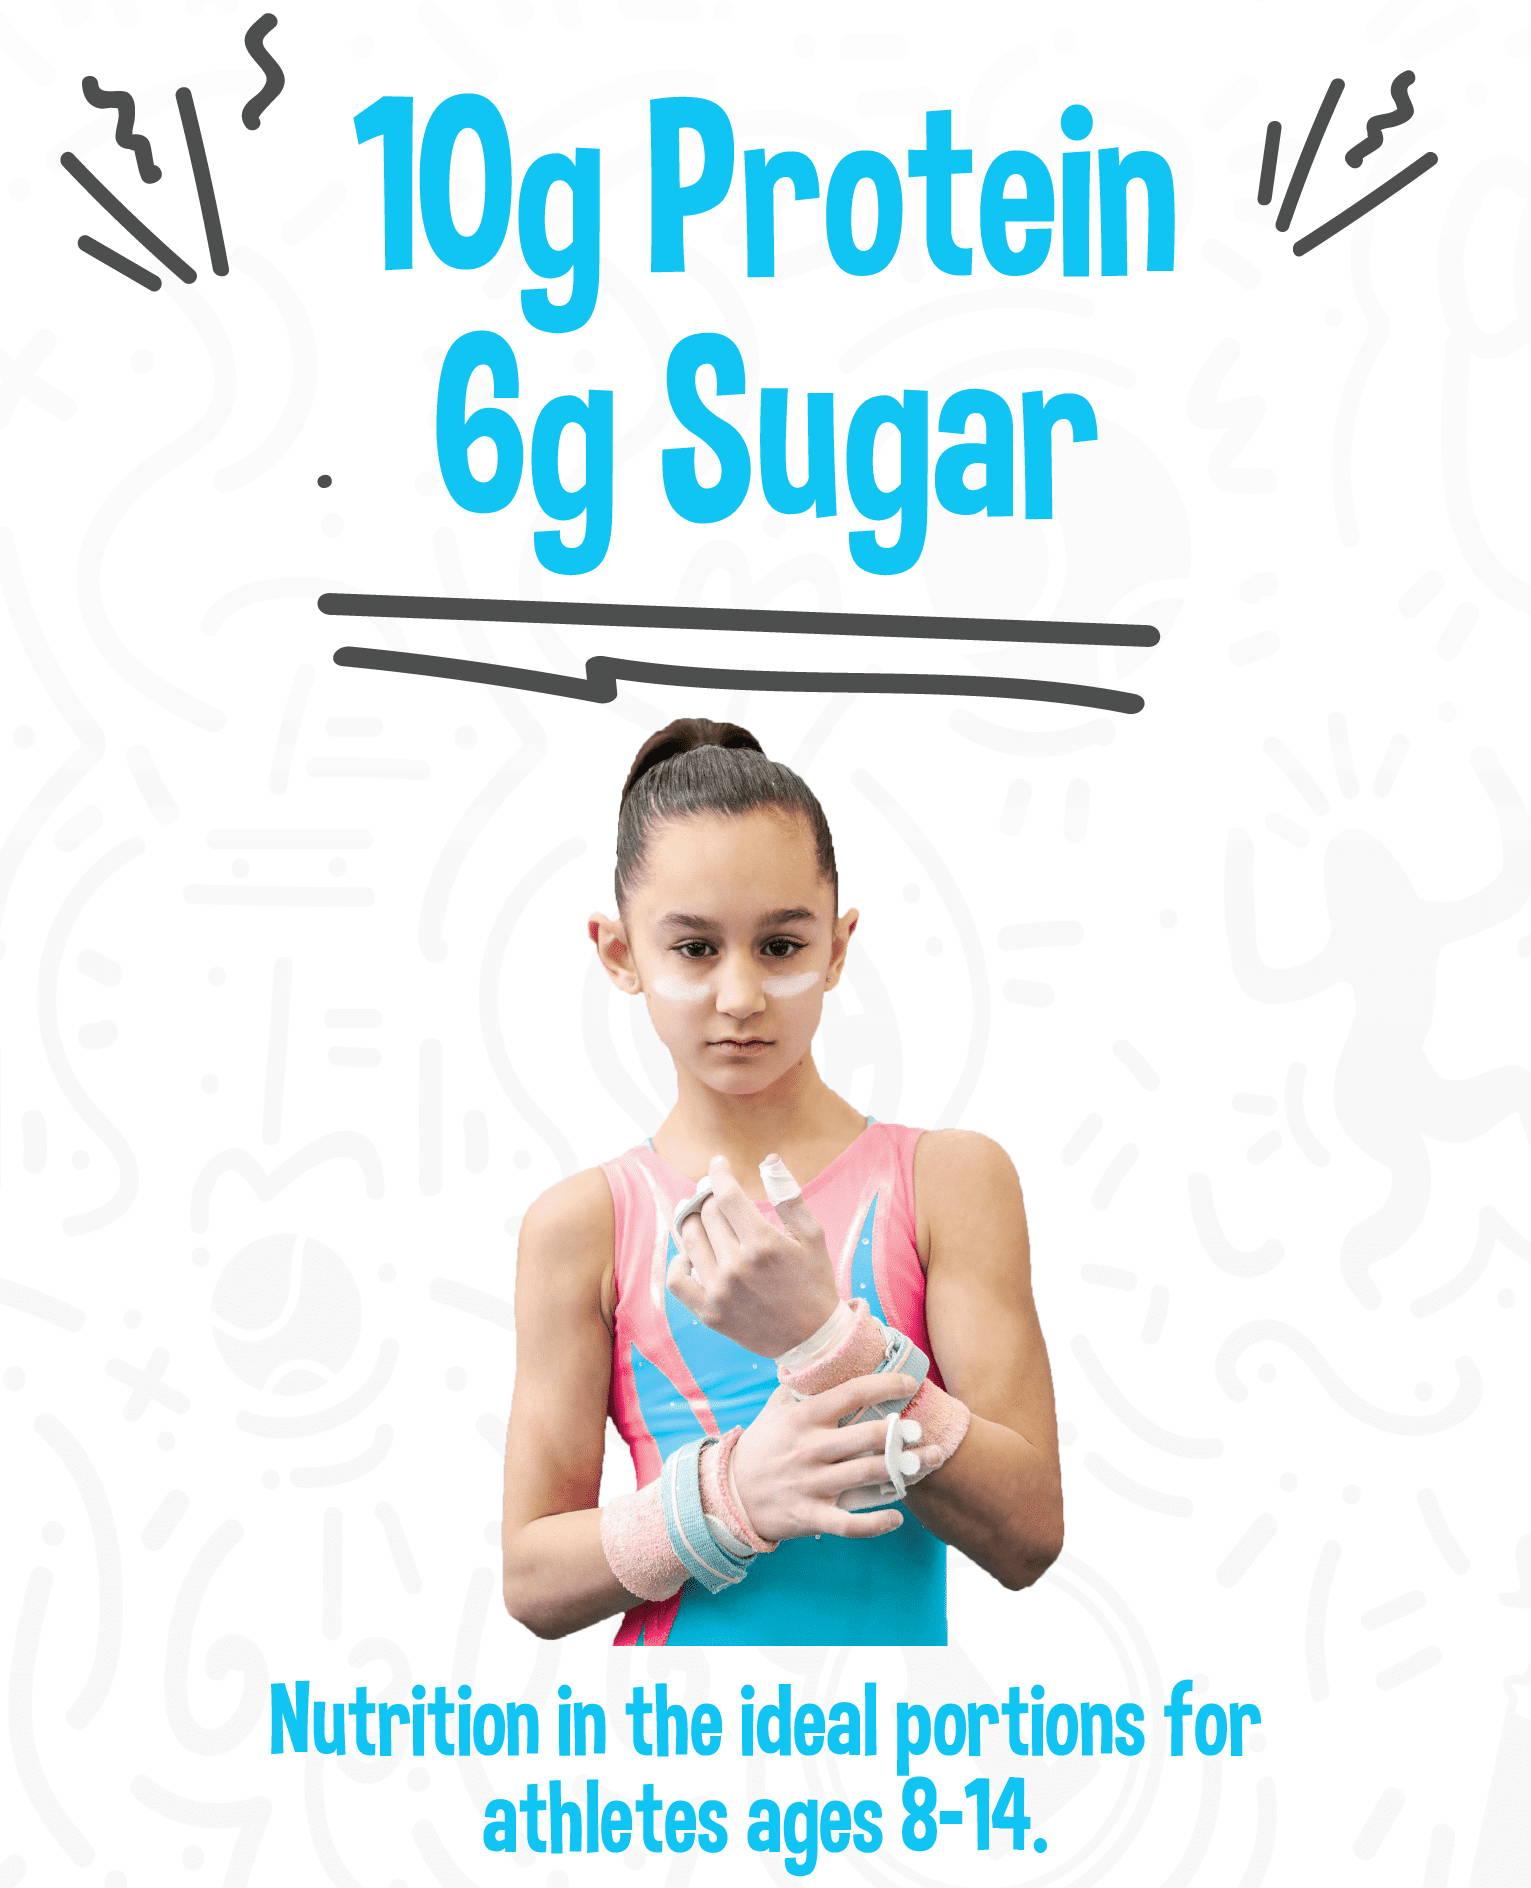 Herofuel 10g Protein, 6g Sugar